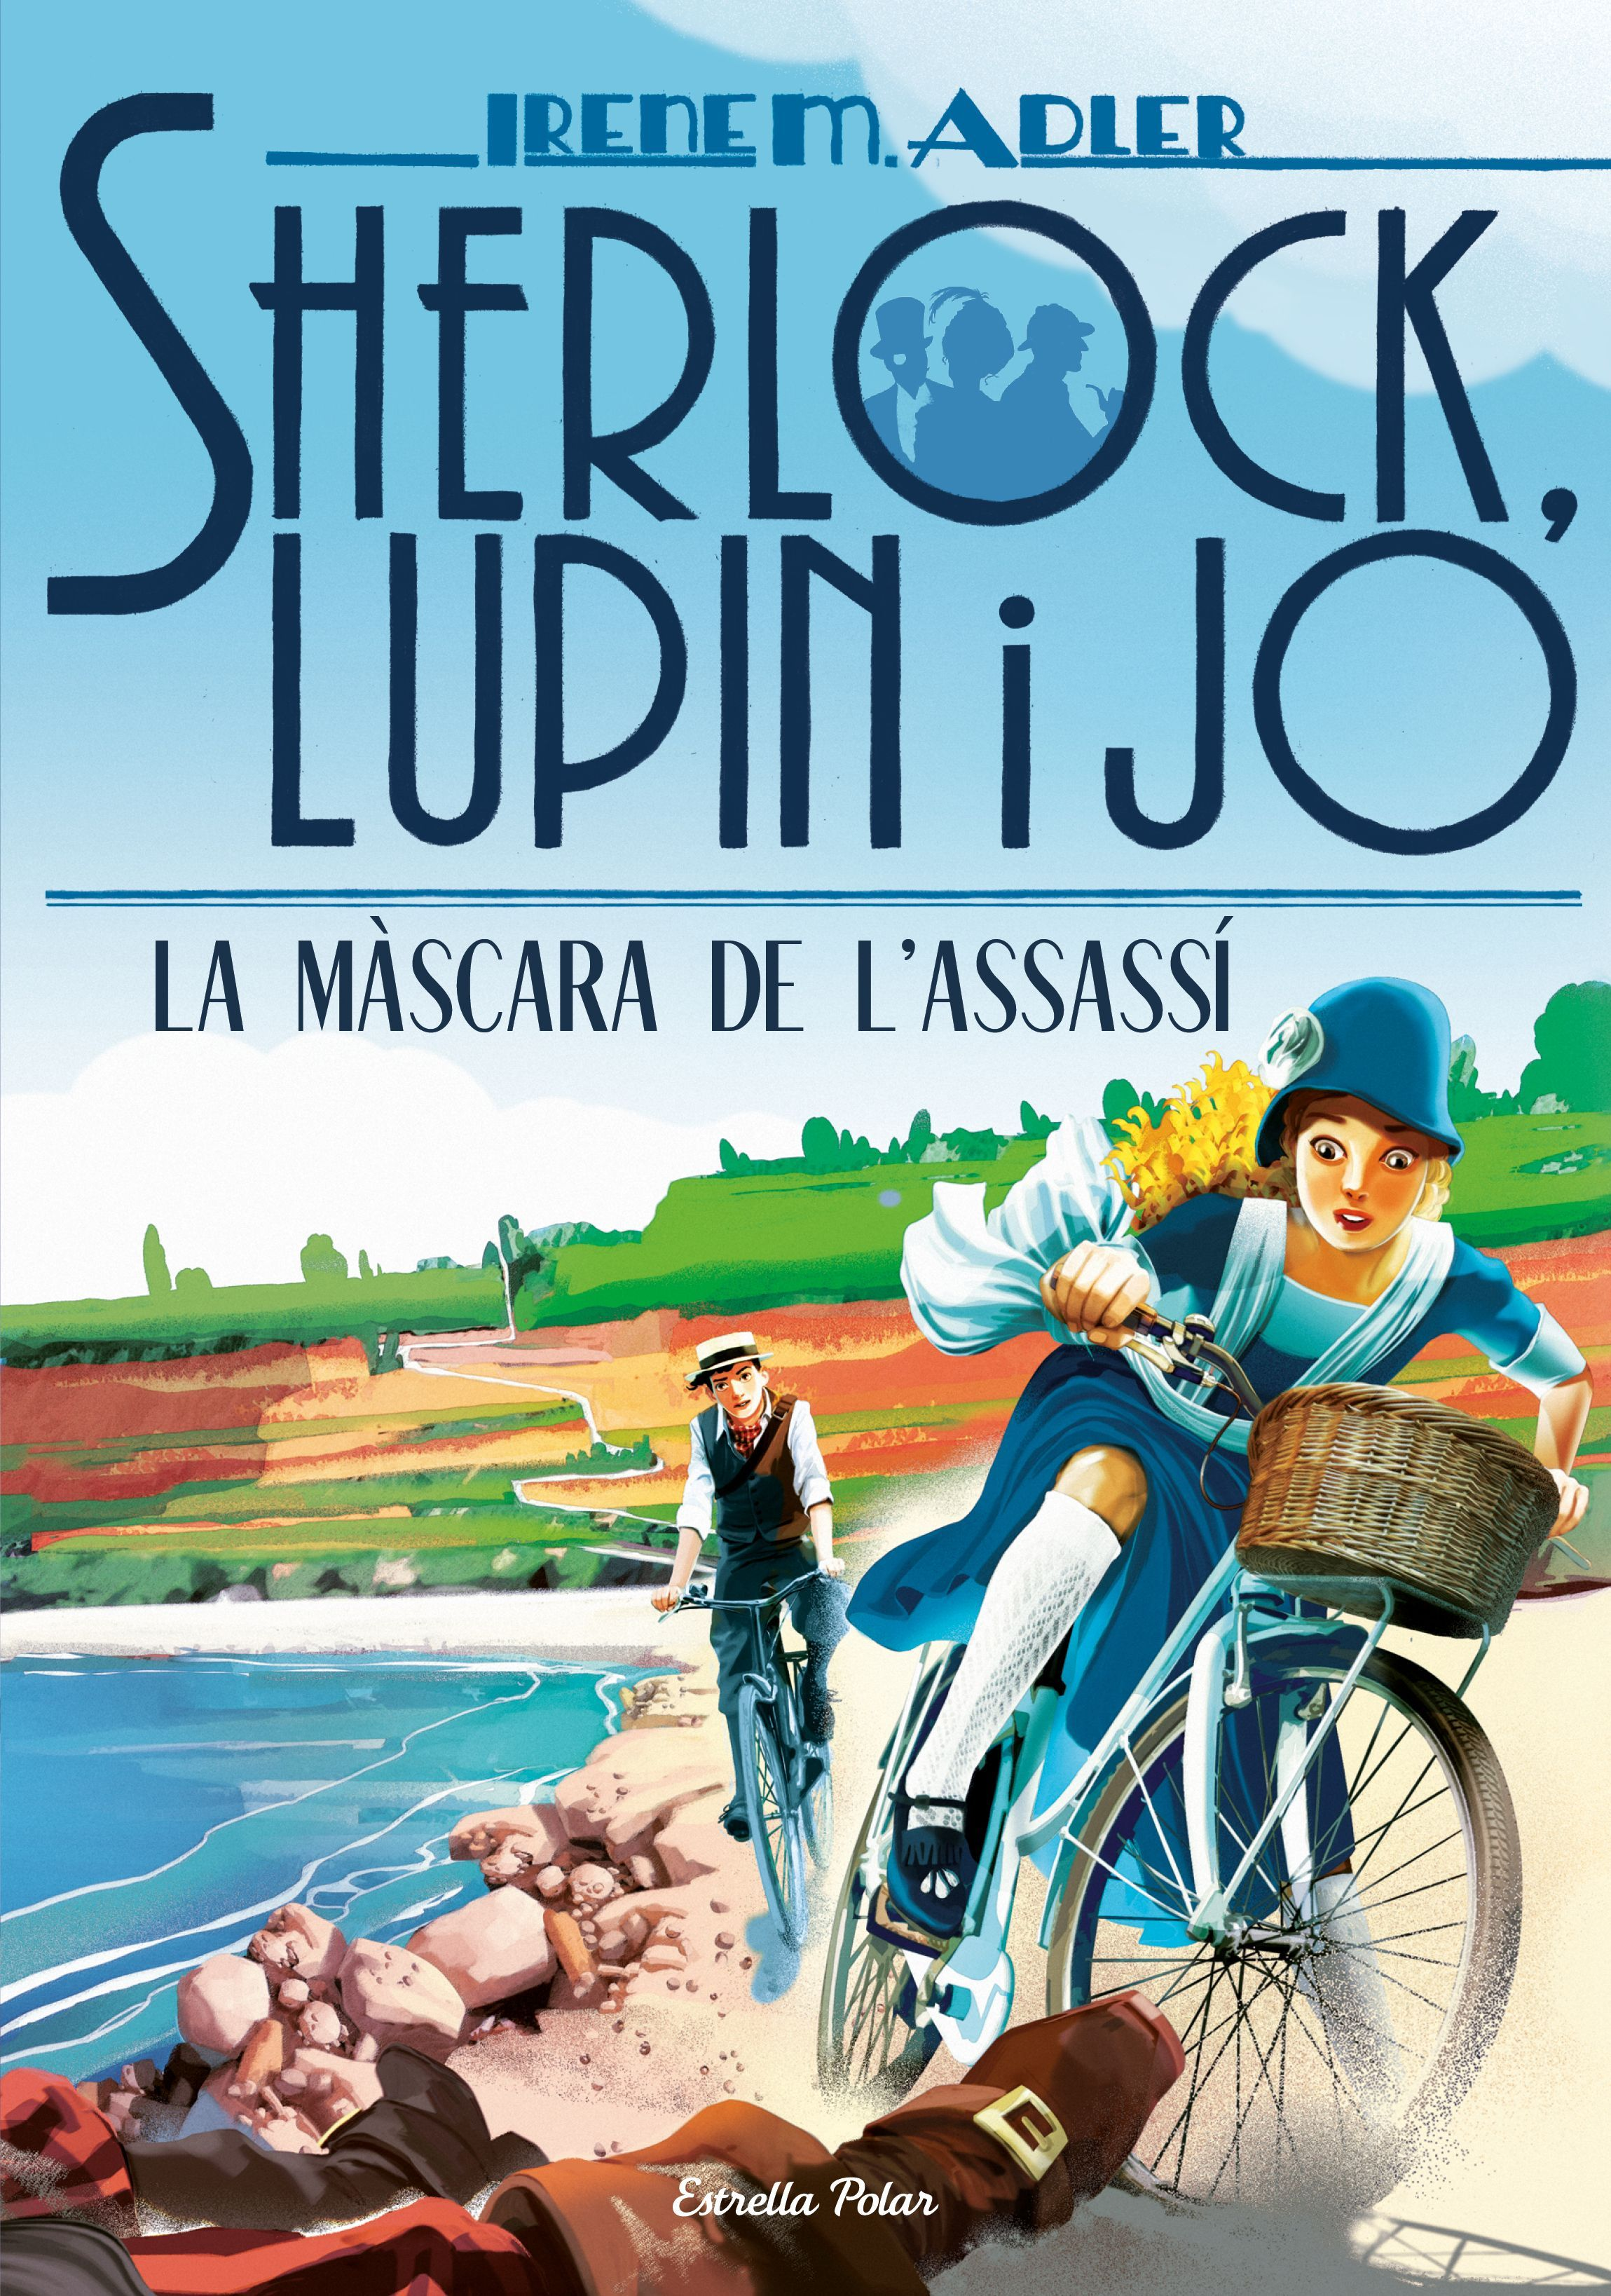 SHERLOCK LUPIN I JO 16 LA MASCARA DE LAASSASSI